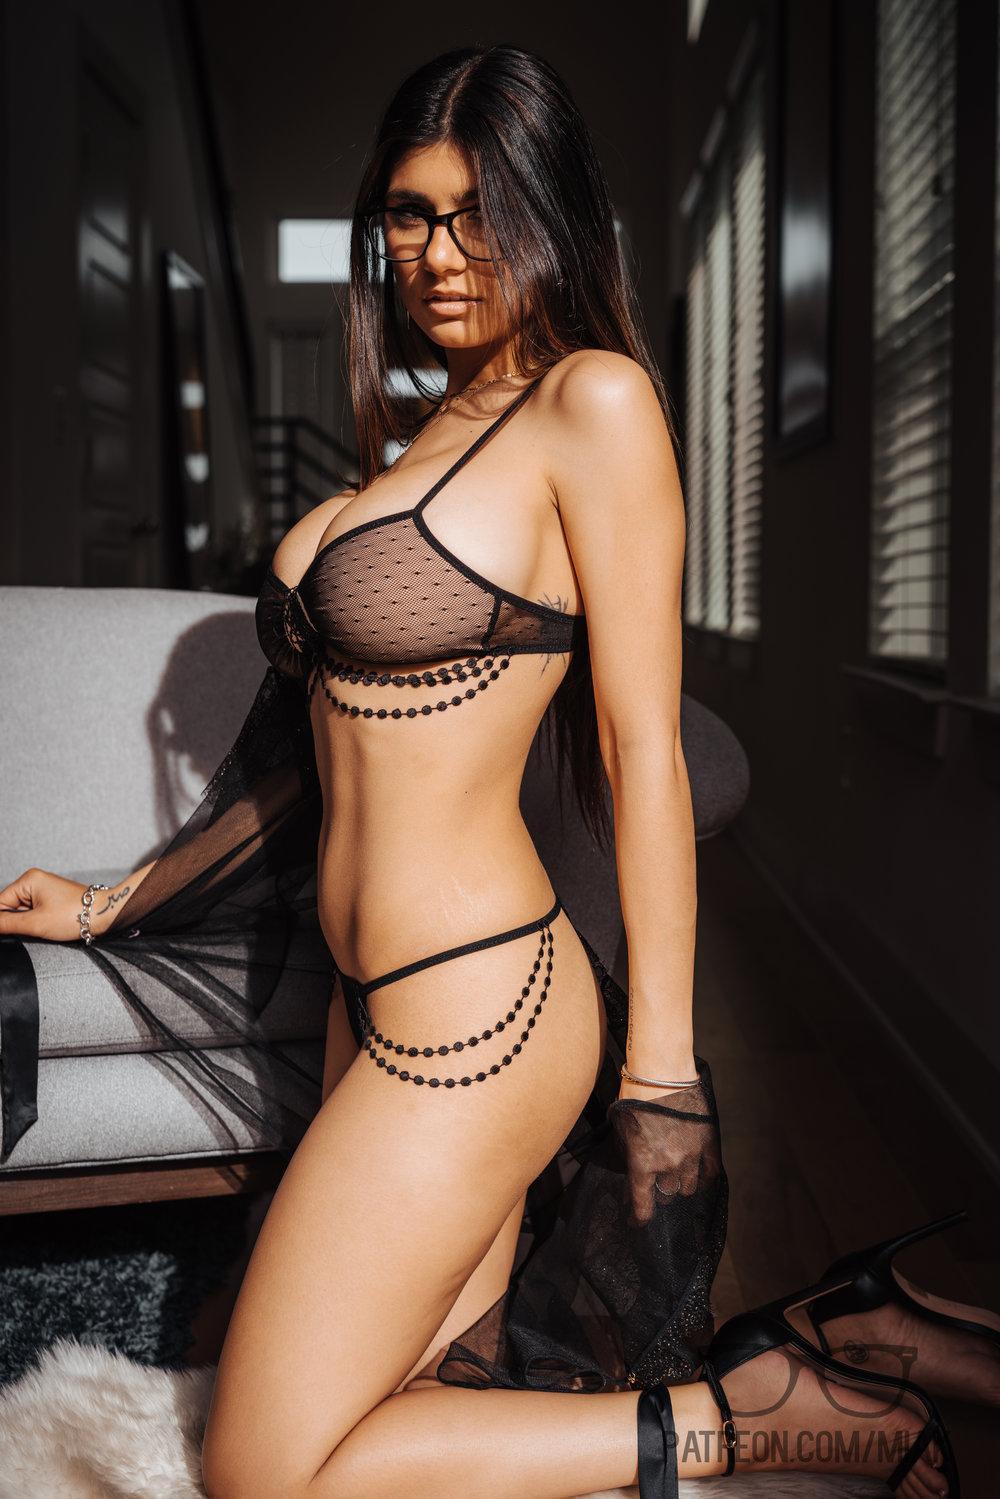 Mia Khalifa Lingerie Stiletto Heels Photoshoot Leaked 0004